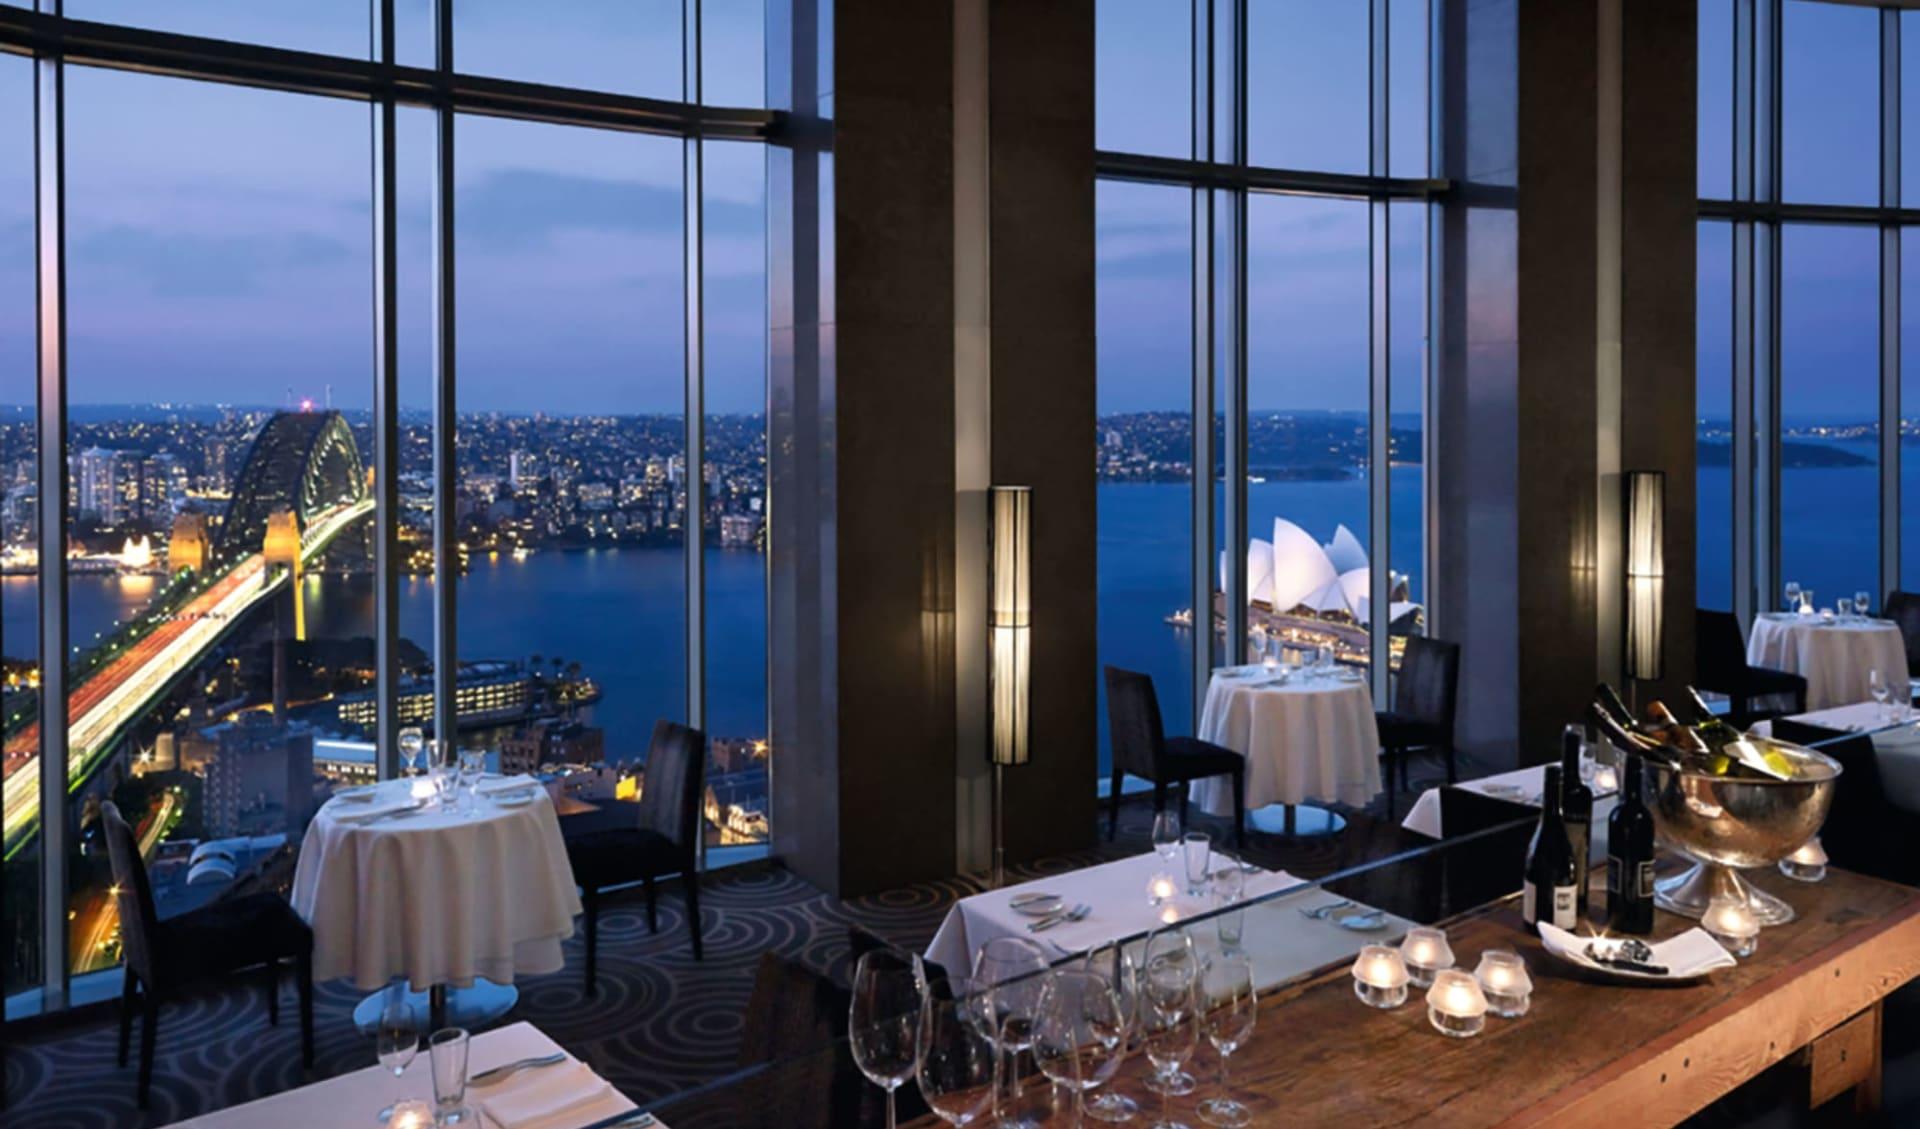 Shangri-La Sydney: Facilities Shangri-La Sydney Australien  Altitude Restaurant mit Blick auf Harbour Bridge und Opernhaus 2017